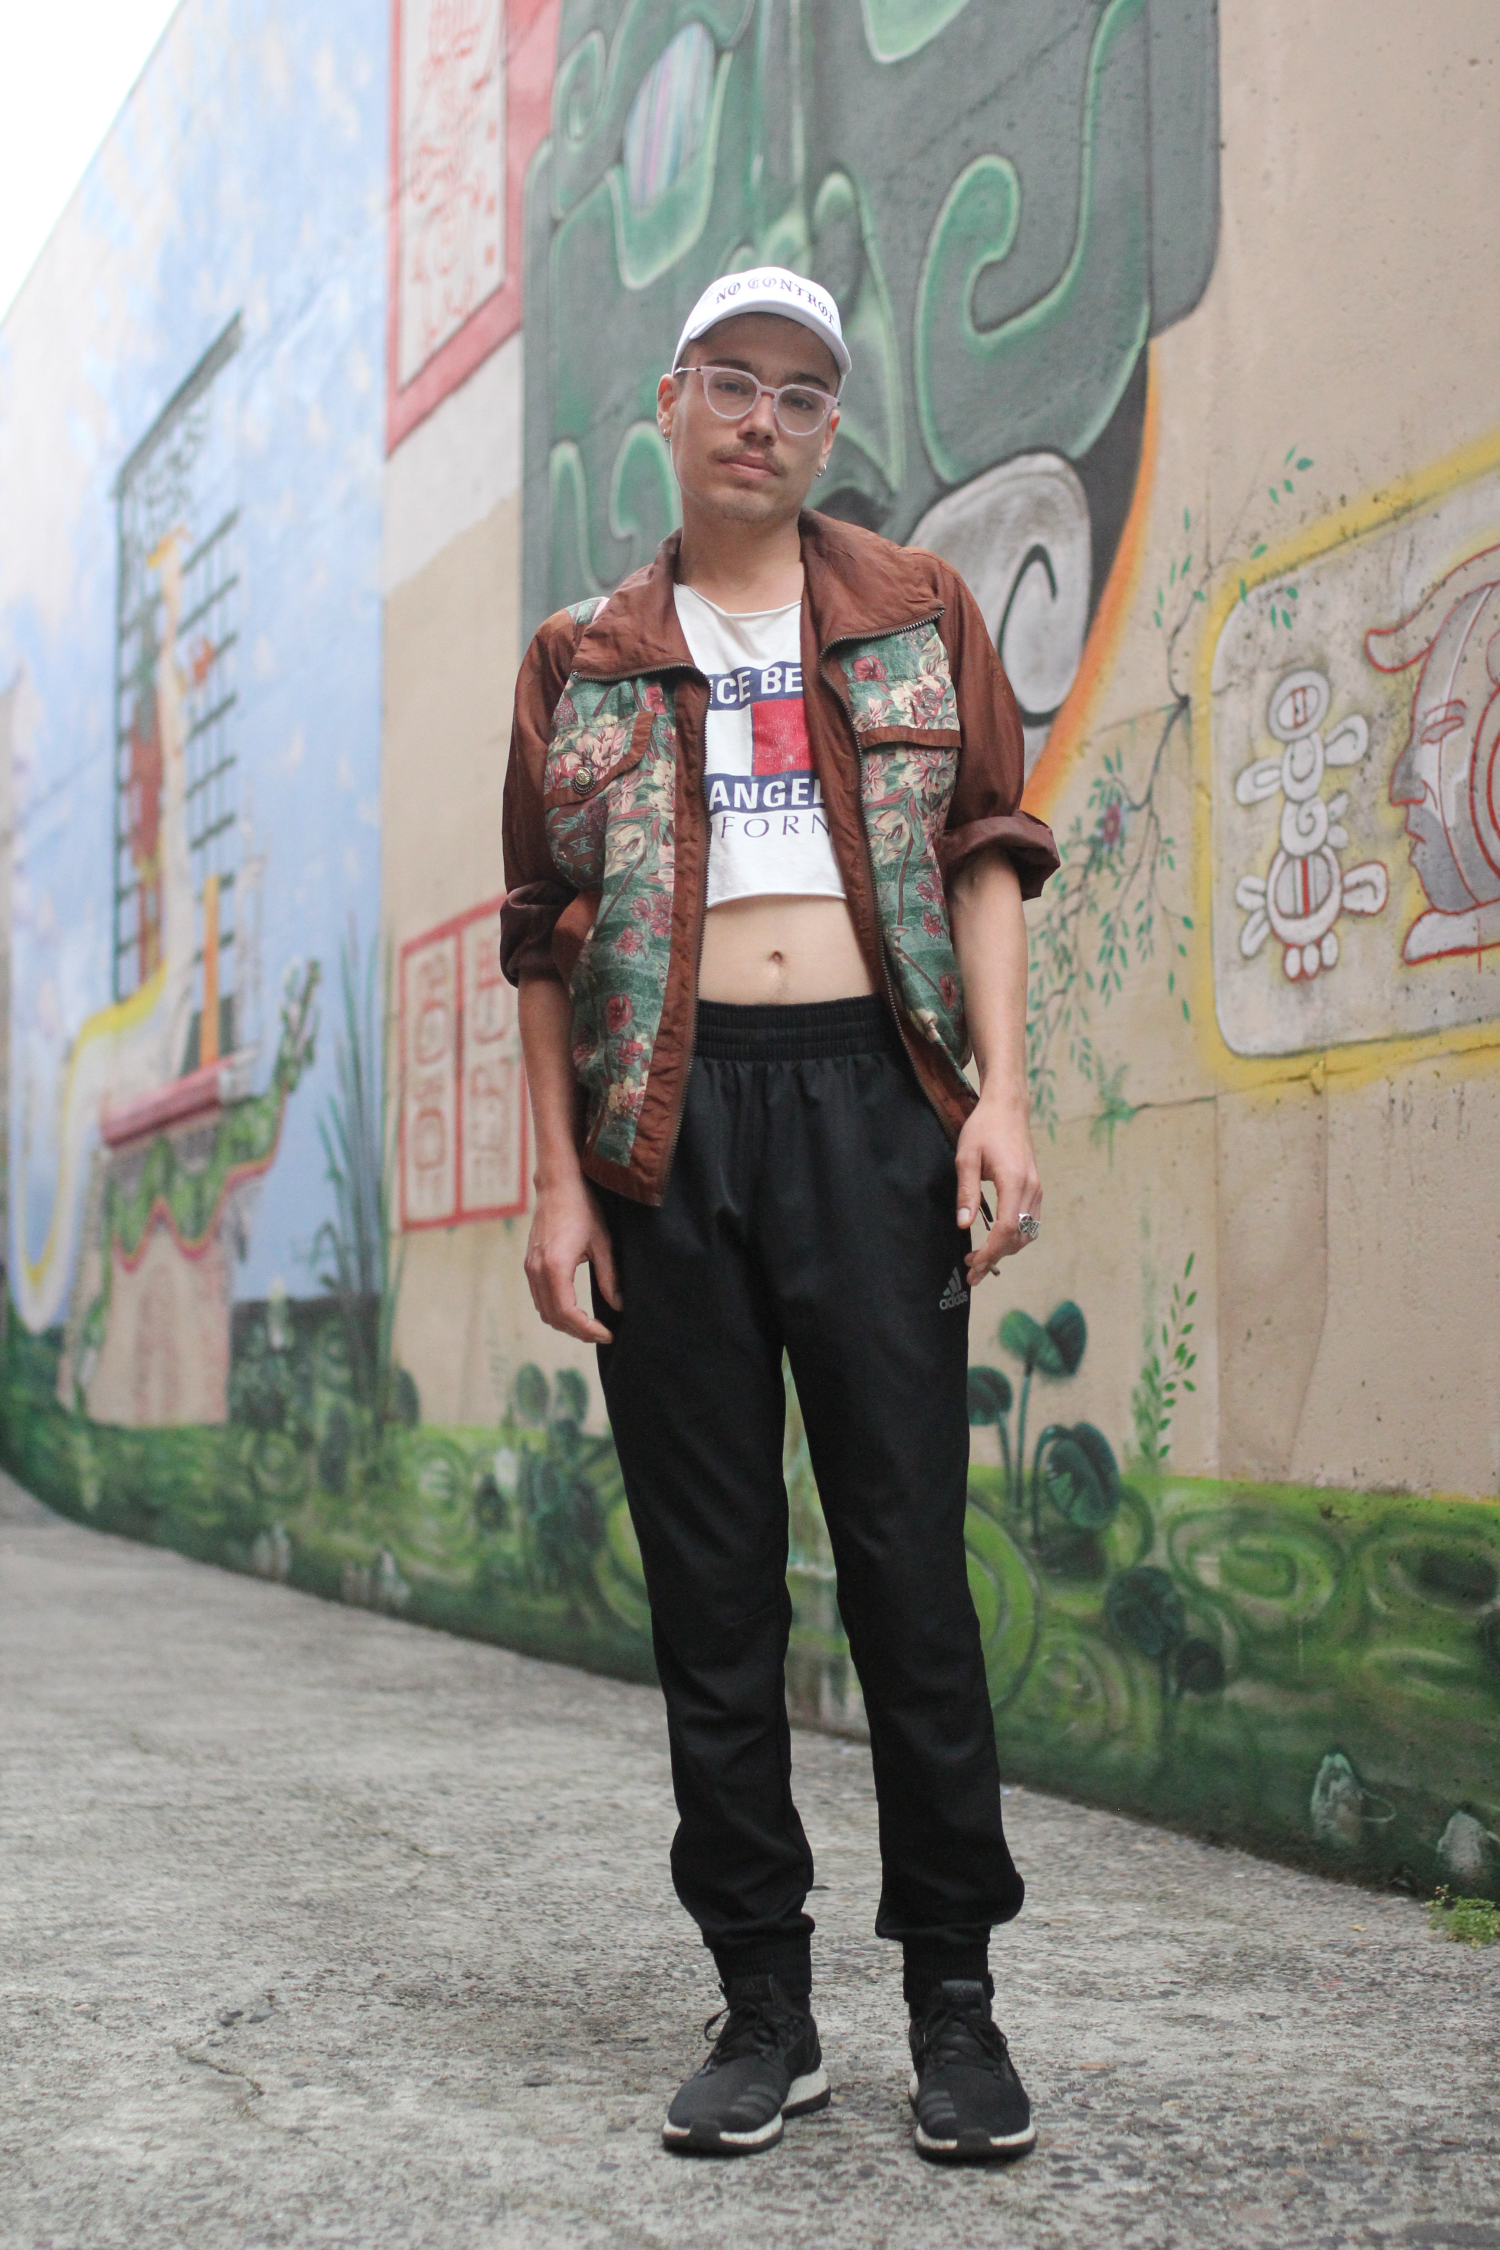 street style - Gary - Qunel.com - Fashion, beauty and